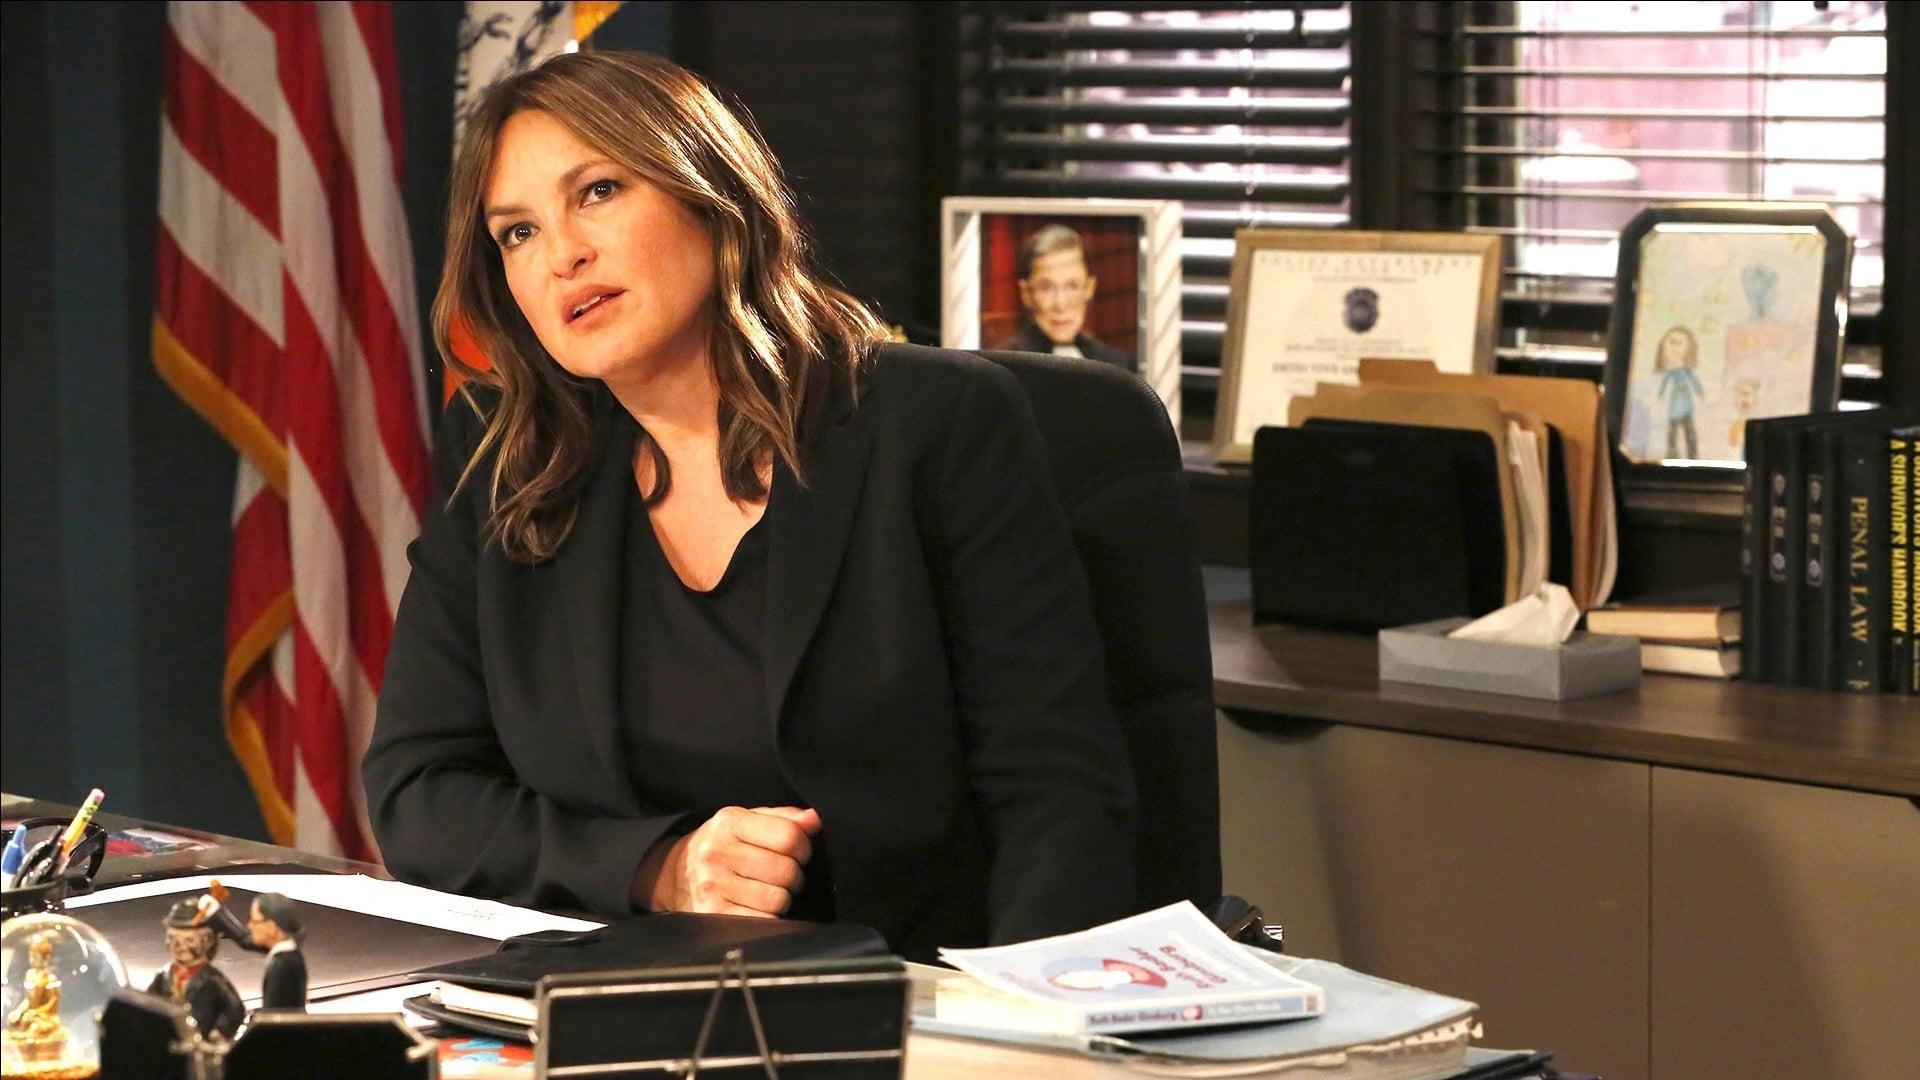 Law & Order: Special Victims Unit - Season 20 Episode 21 : Exchange